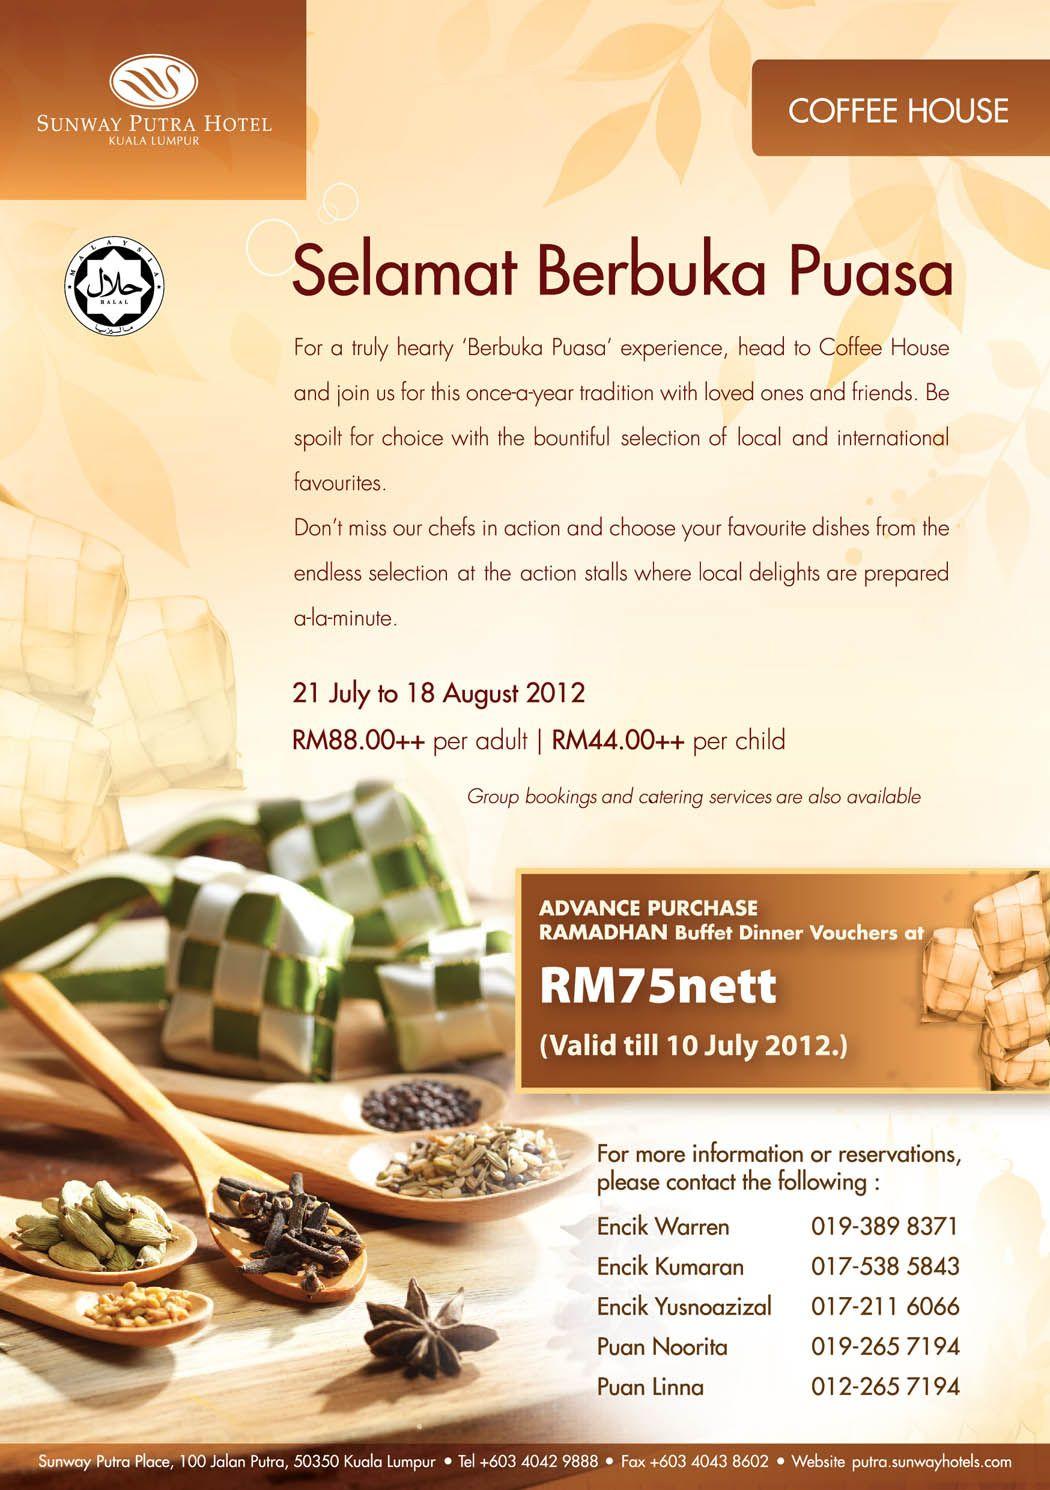 Good News! Sunway Putra Hotel Kuala Lumpur is offering